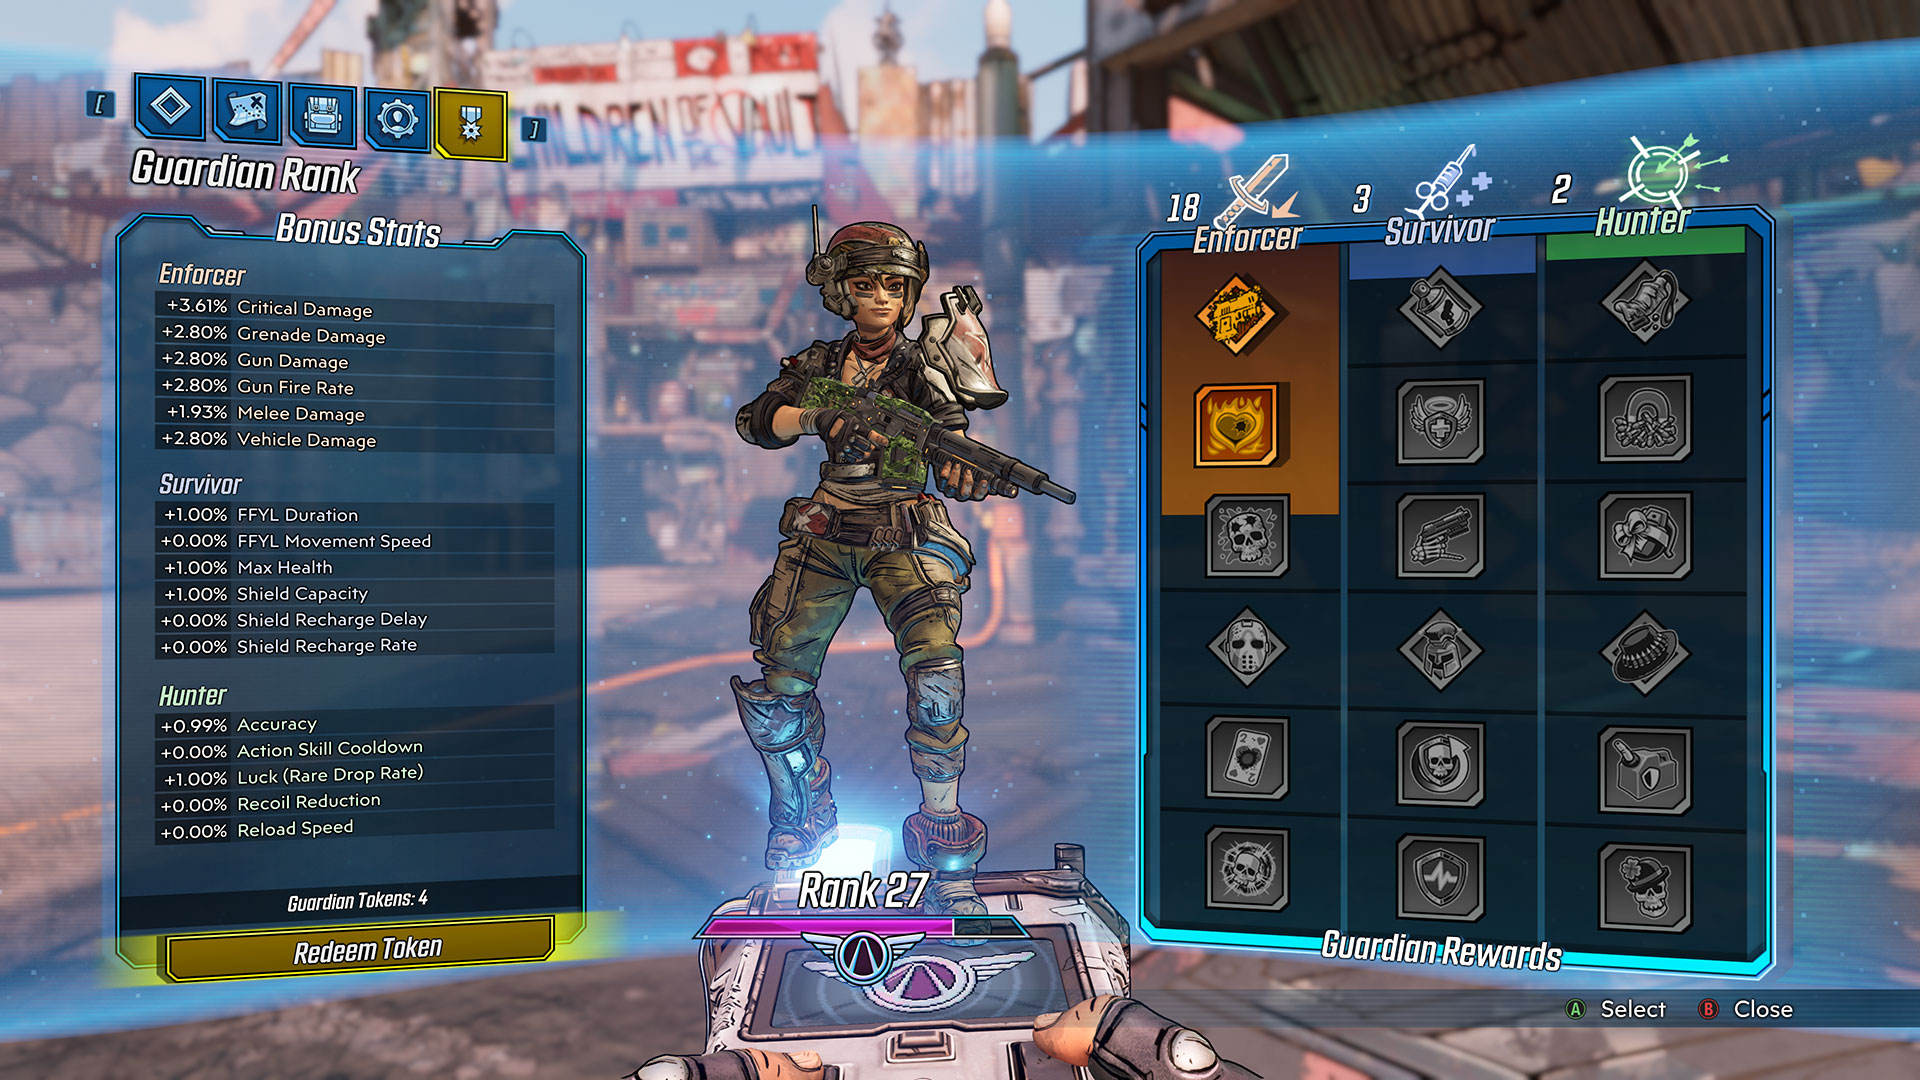 Borderlands 2 end game mode animated slot machine gif